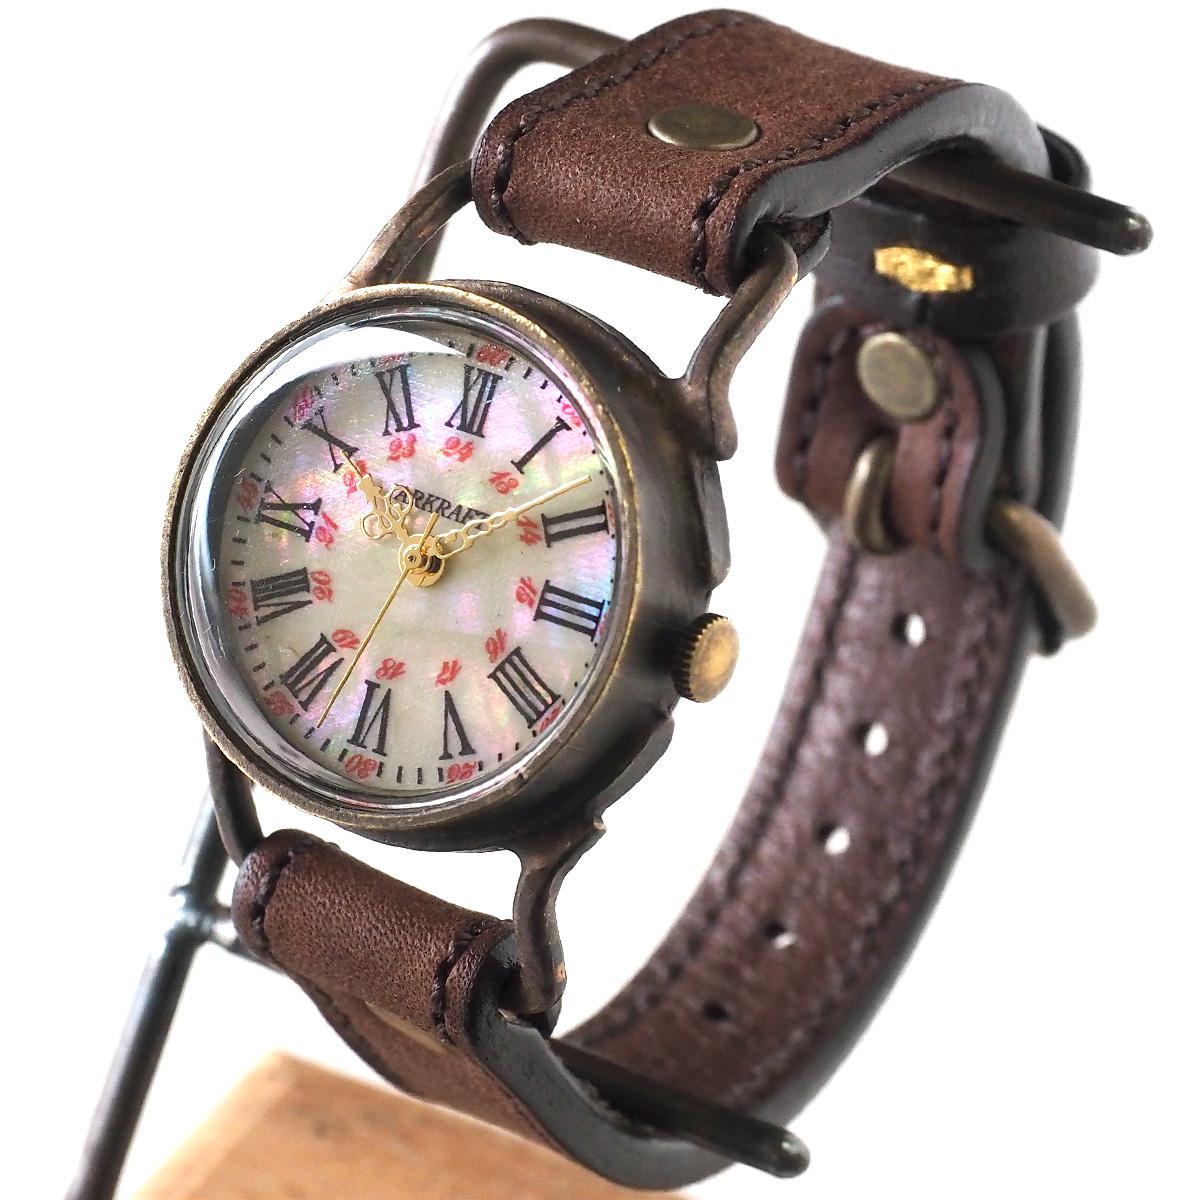 "ARKRAFT(アークラフト) 時計作家・新木秀和 手作り腕時計 ""Drake Medium""シェル文字盤 赤ドット プレミアムストラップ [AR-C-020-BL-RD]"